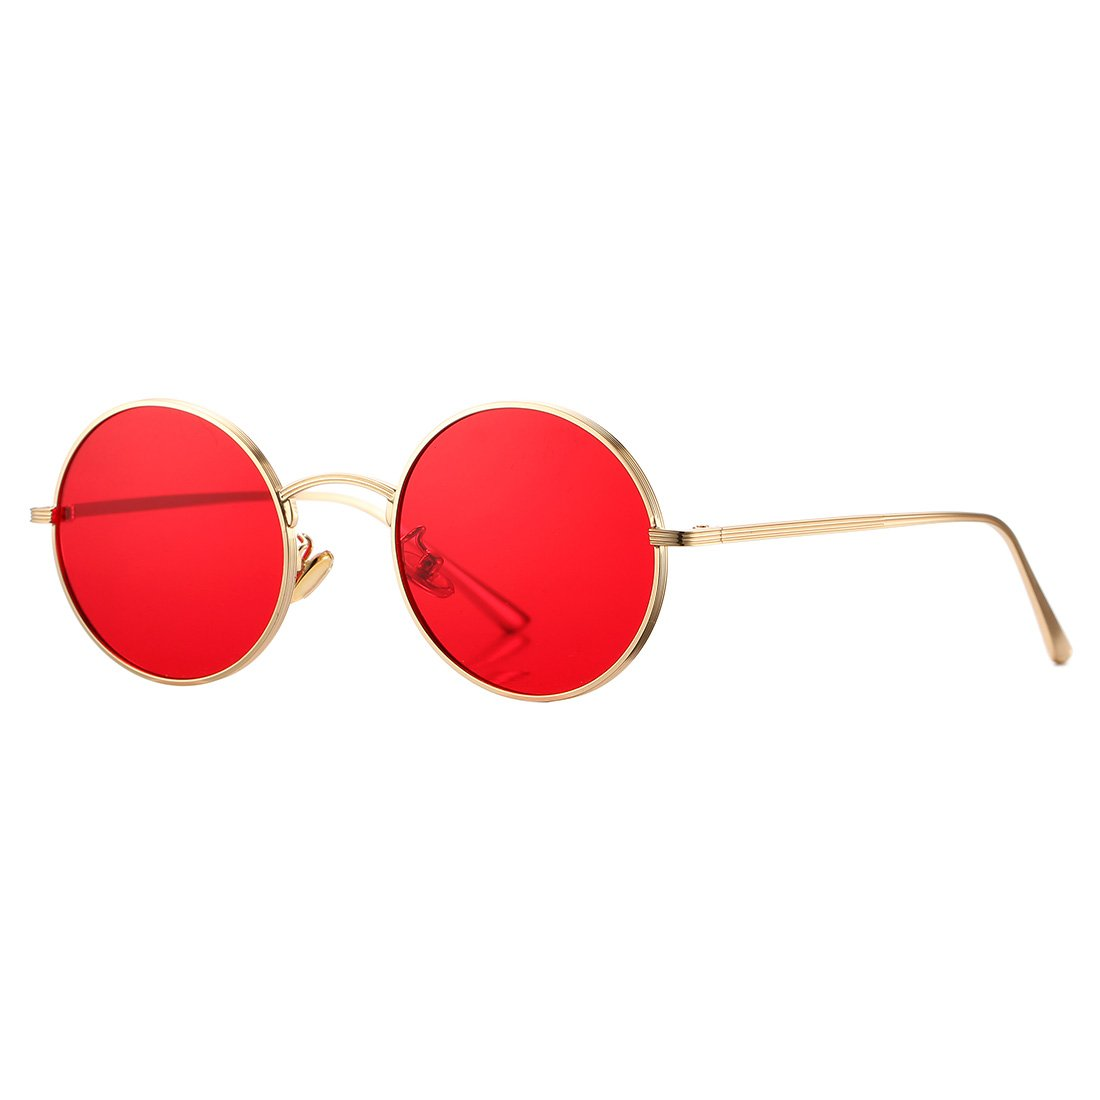 e3c0d560cb Amazon.com  COASION Vintage Round Metal Sunglasses John Lennon Style Small  Unisex Sun Glasses (Gold Frame Red Lens)  Clothing